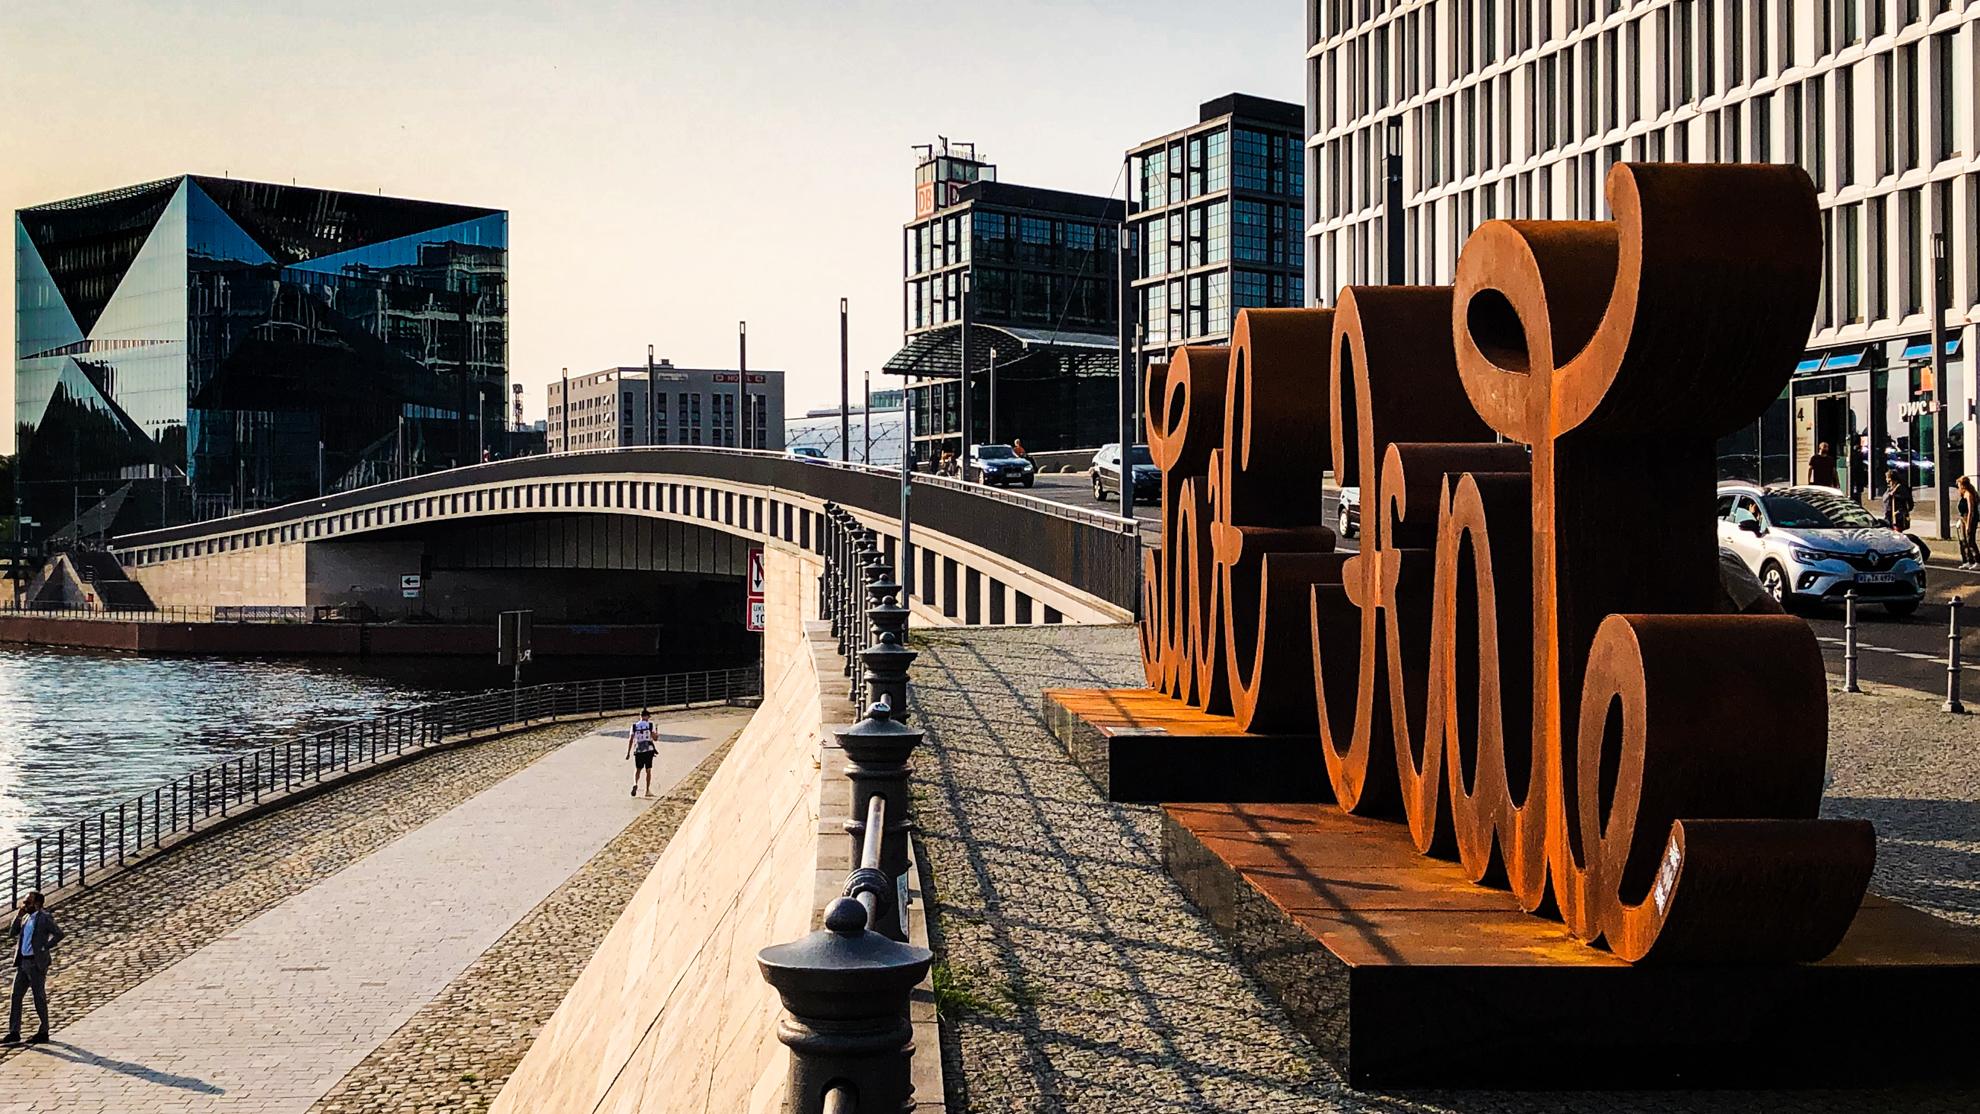 Love & Hate - Skulptur am Hauptbahnhof Berlin